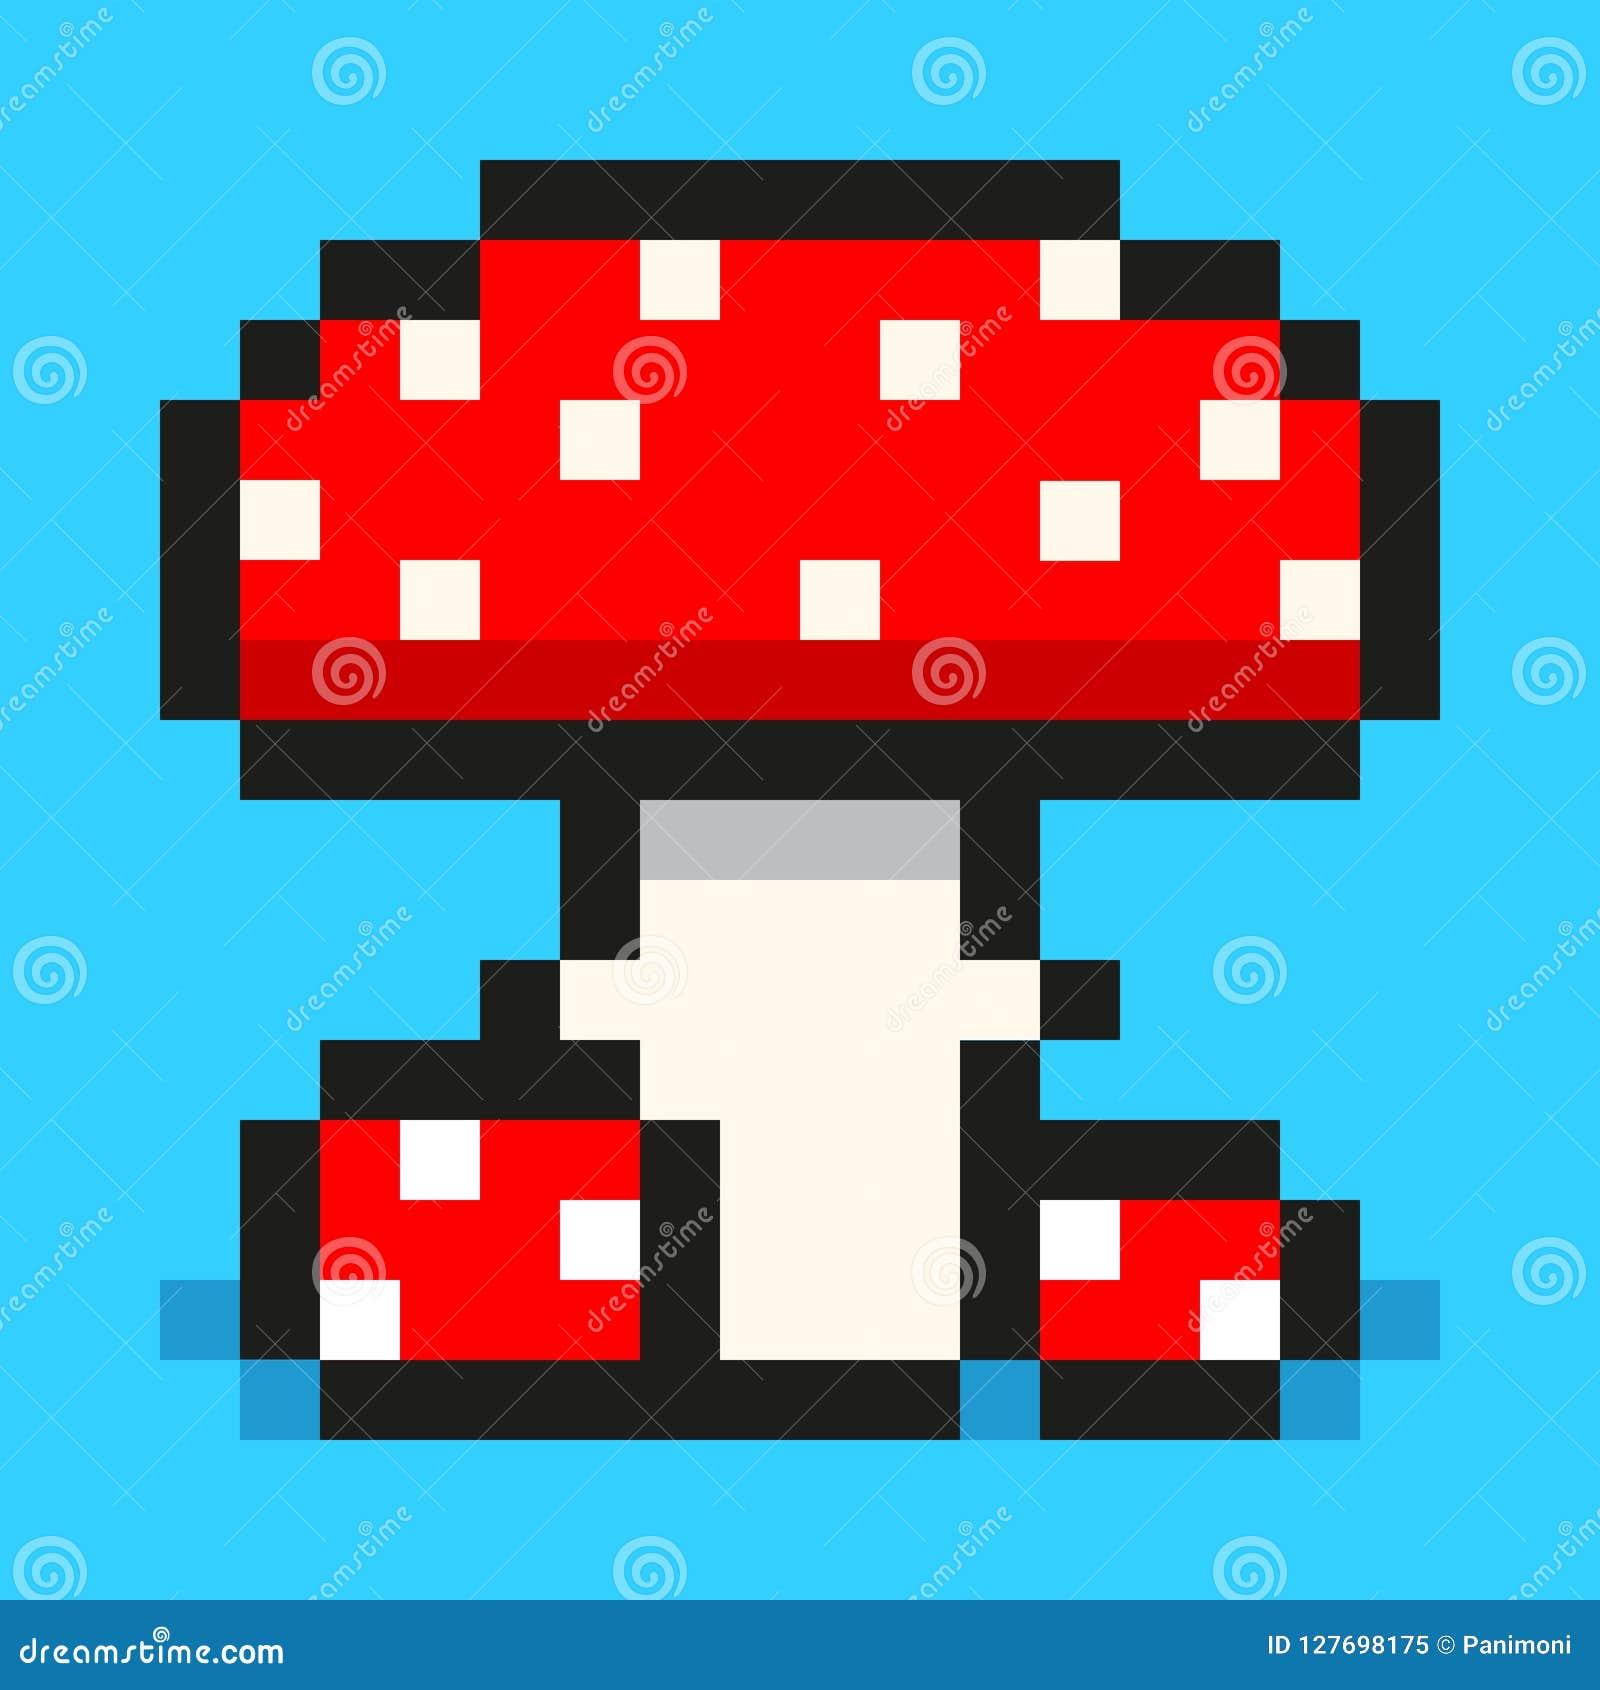 images?q=tbn:ANd9GcQh_l3eQ5xwiPy07kGEXjmjgmBKBRB7H2mRxCGhv1tFWg5c_mWT Pixel Art Website Design @koolgadgetz.com.info